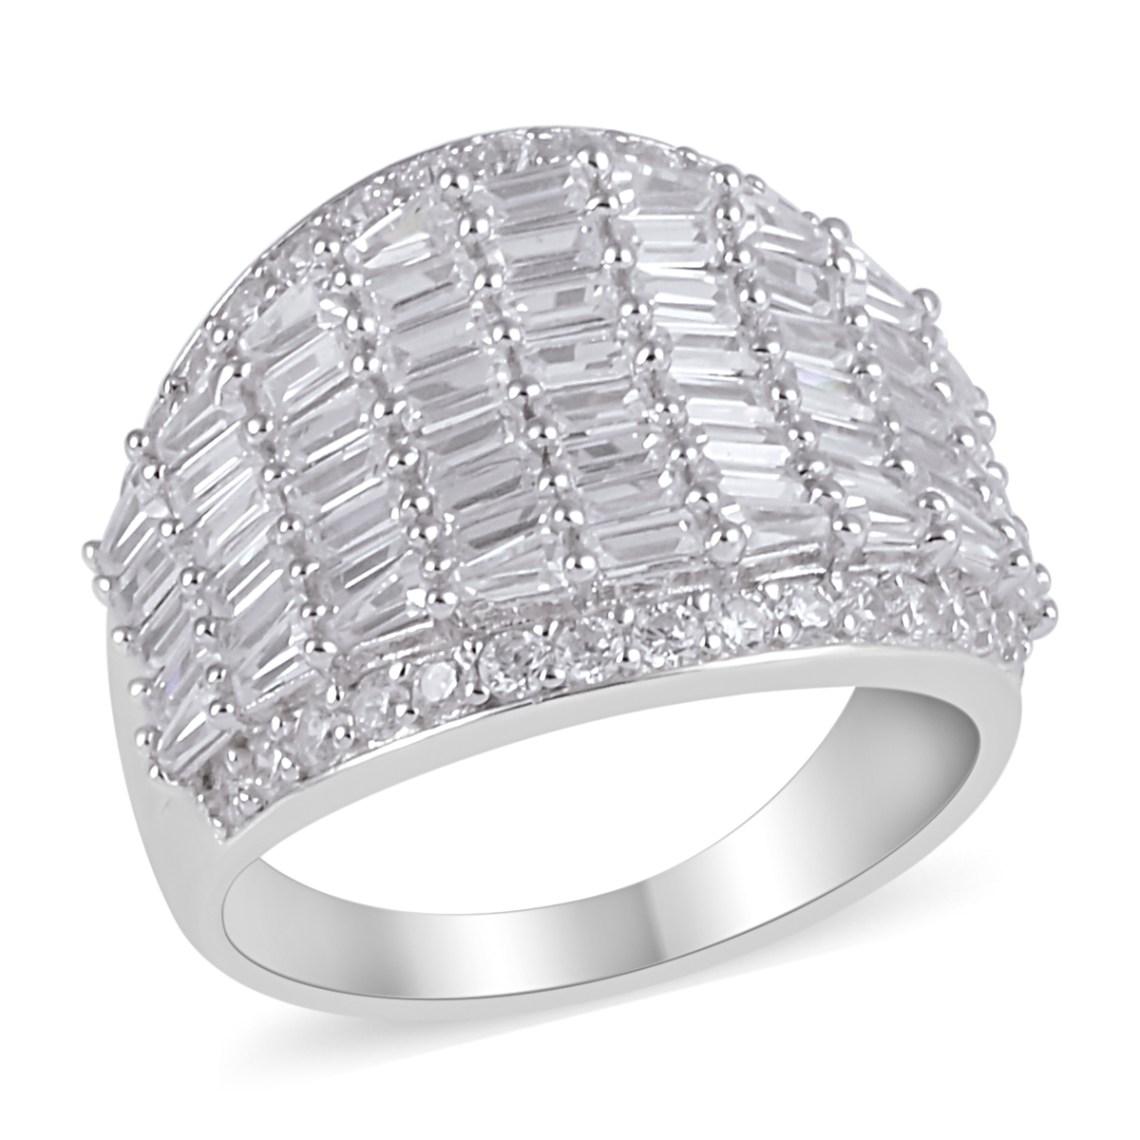 Lustro Stella cubic zirconia ring.